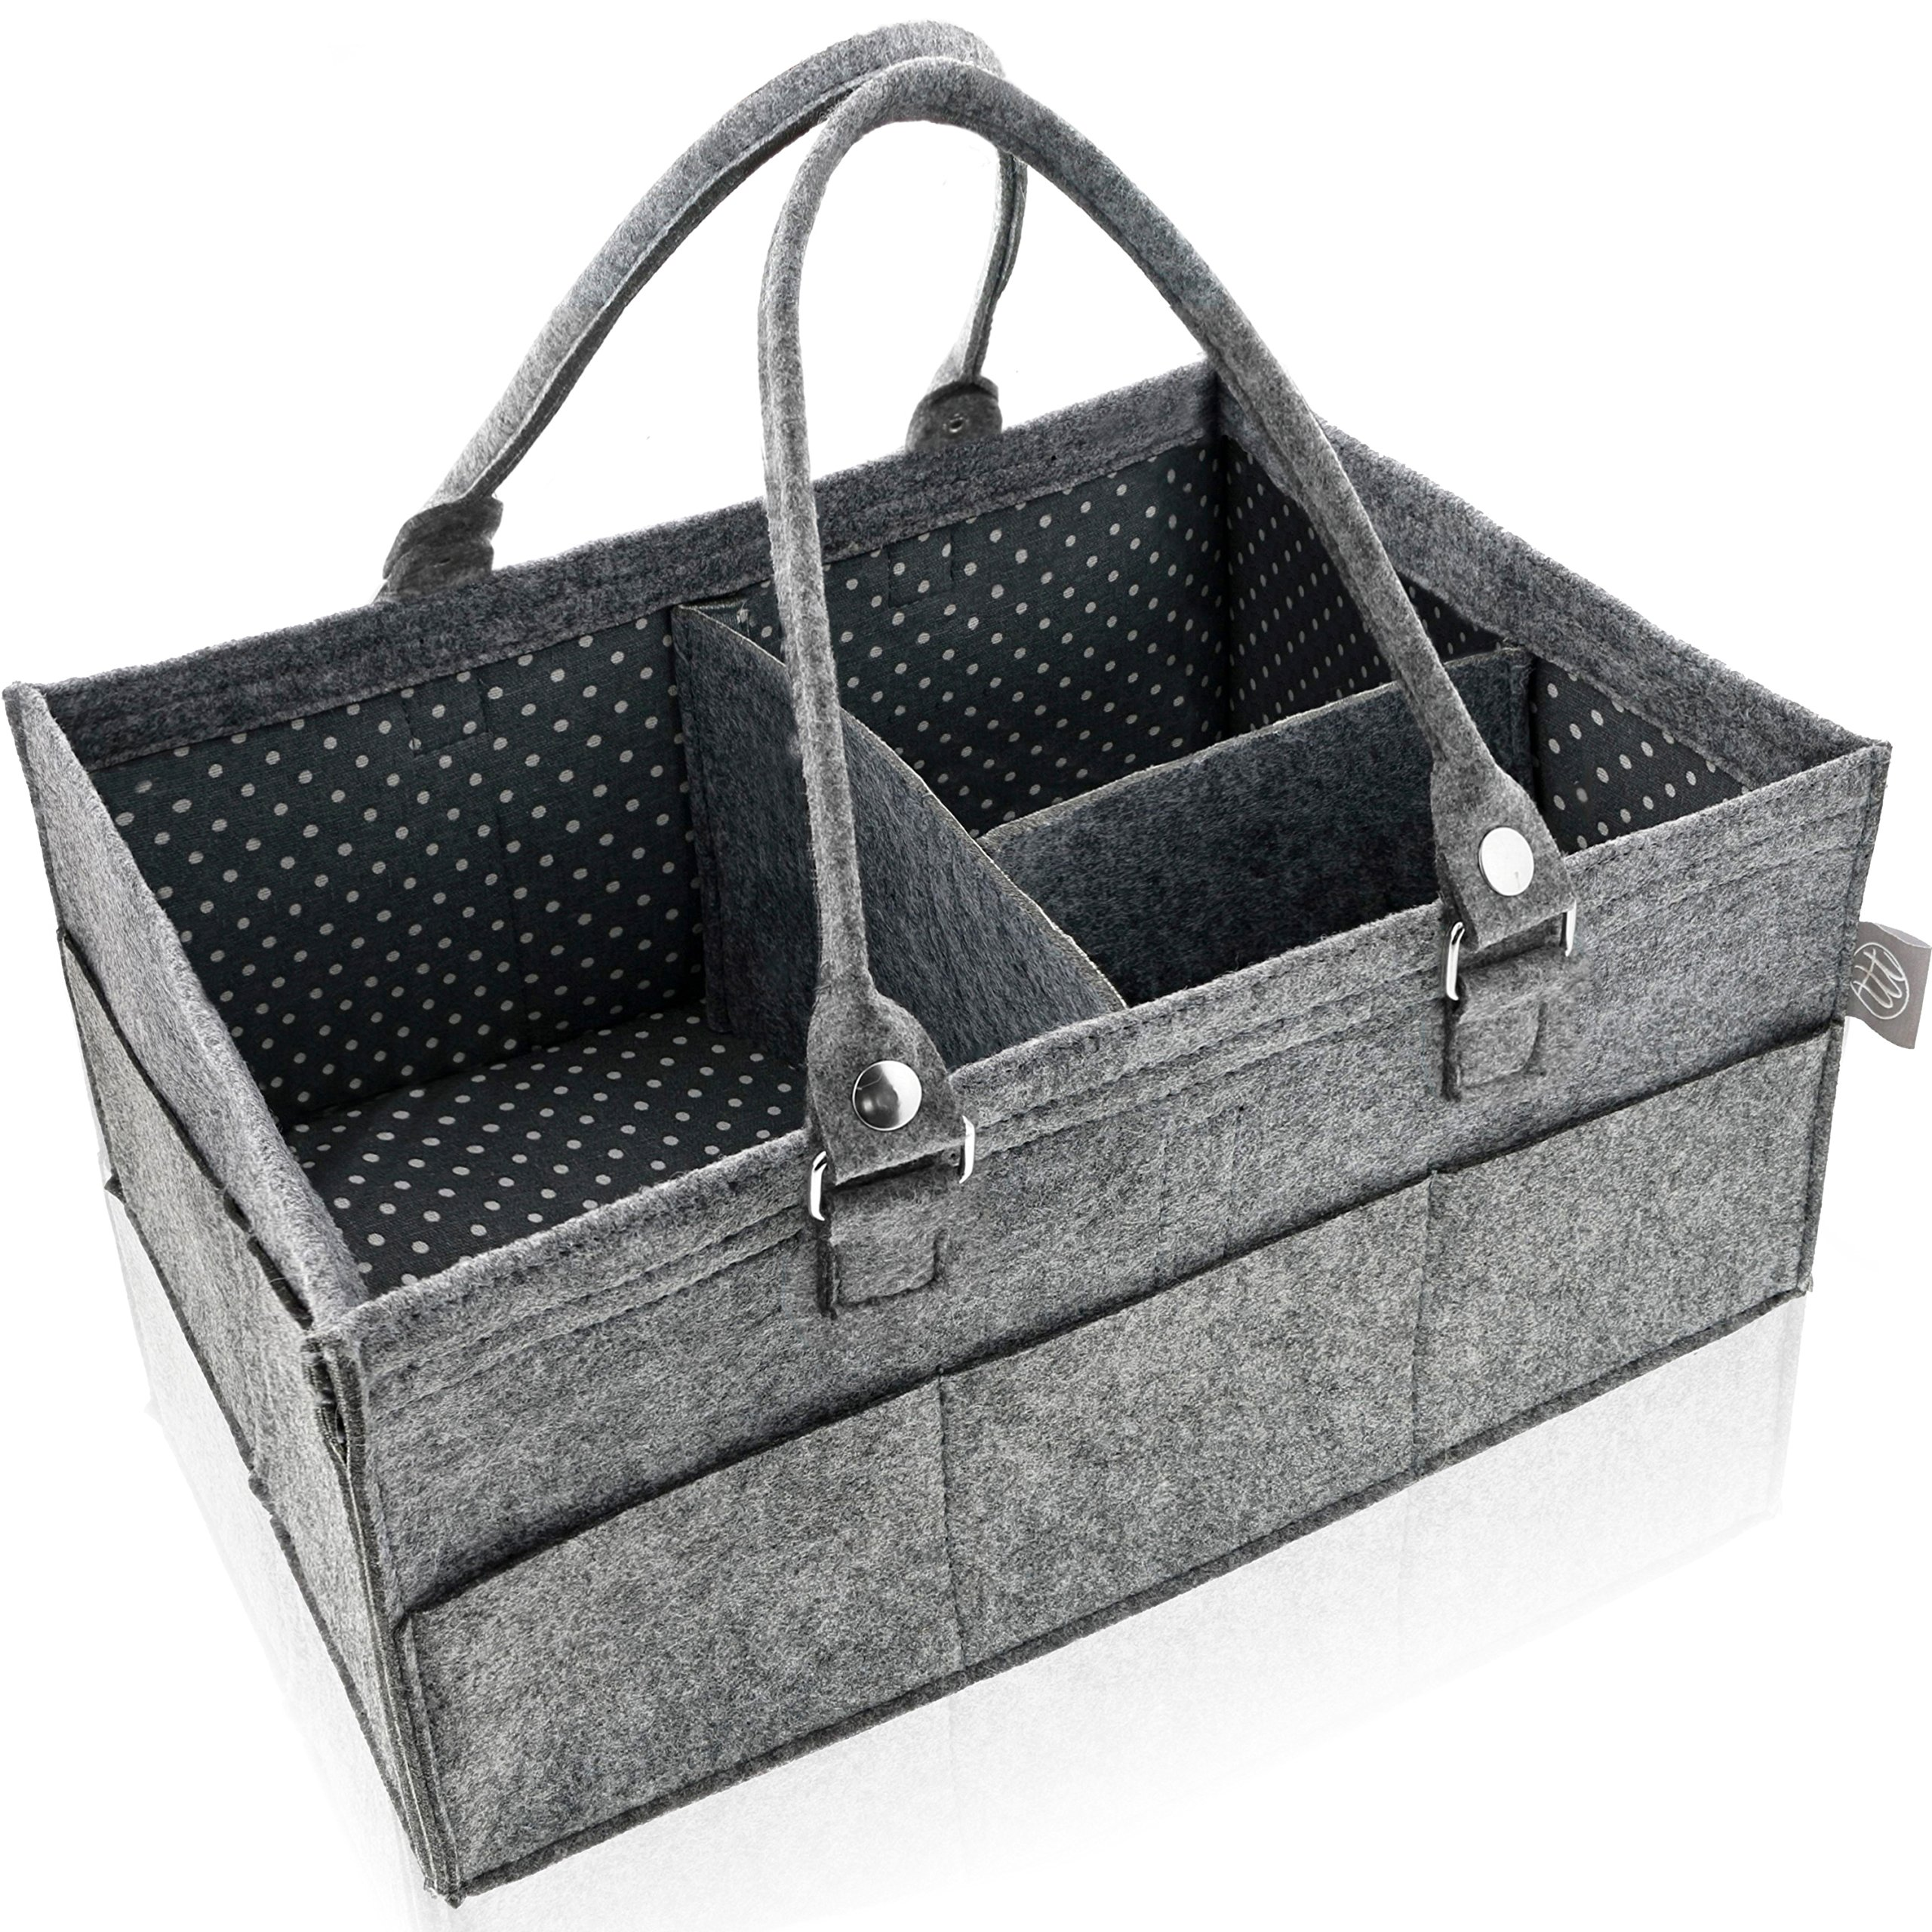 Diaper Caddy Organizer - Nursery Storage Bin - Baby Shower Gift Basket for Girl or Boy - Car Travel Caddy Organizer for Kid Toys and Wipes - Newborn Registry Must Have